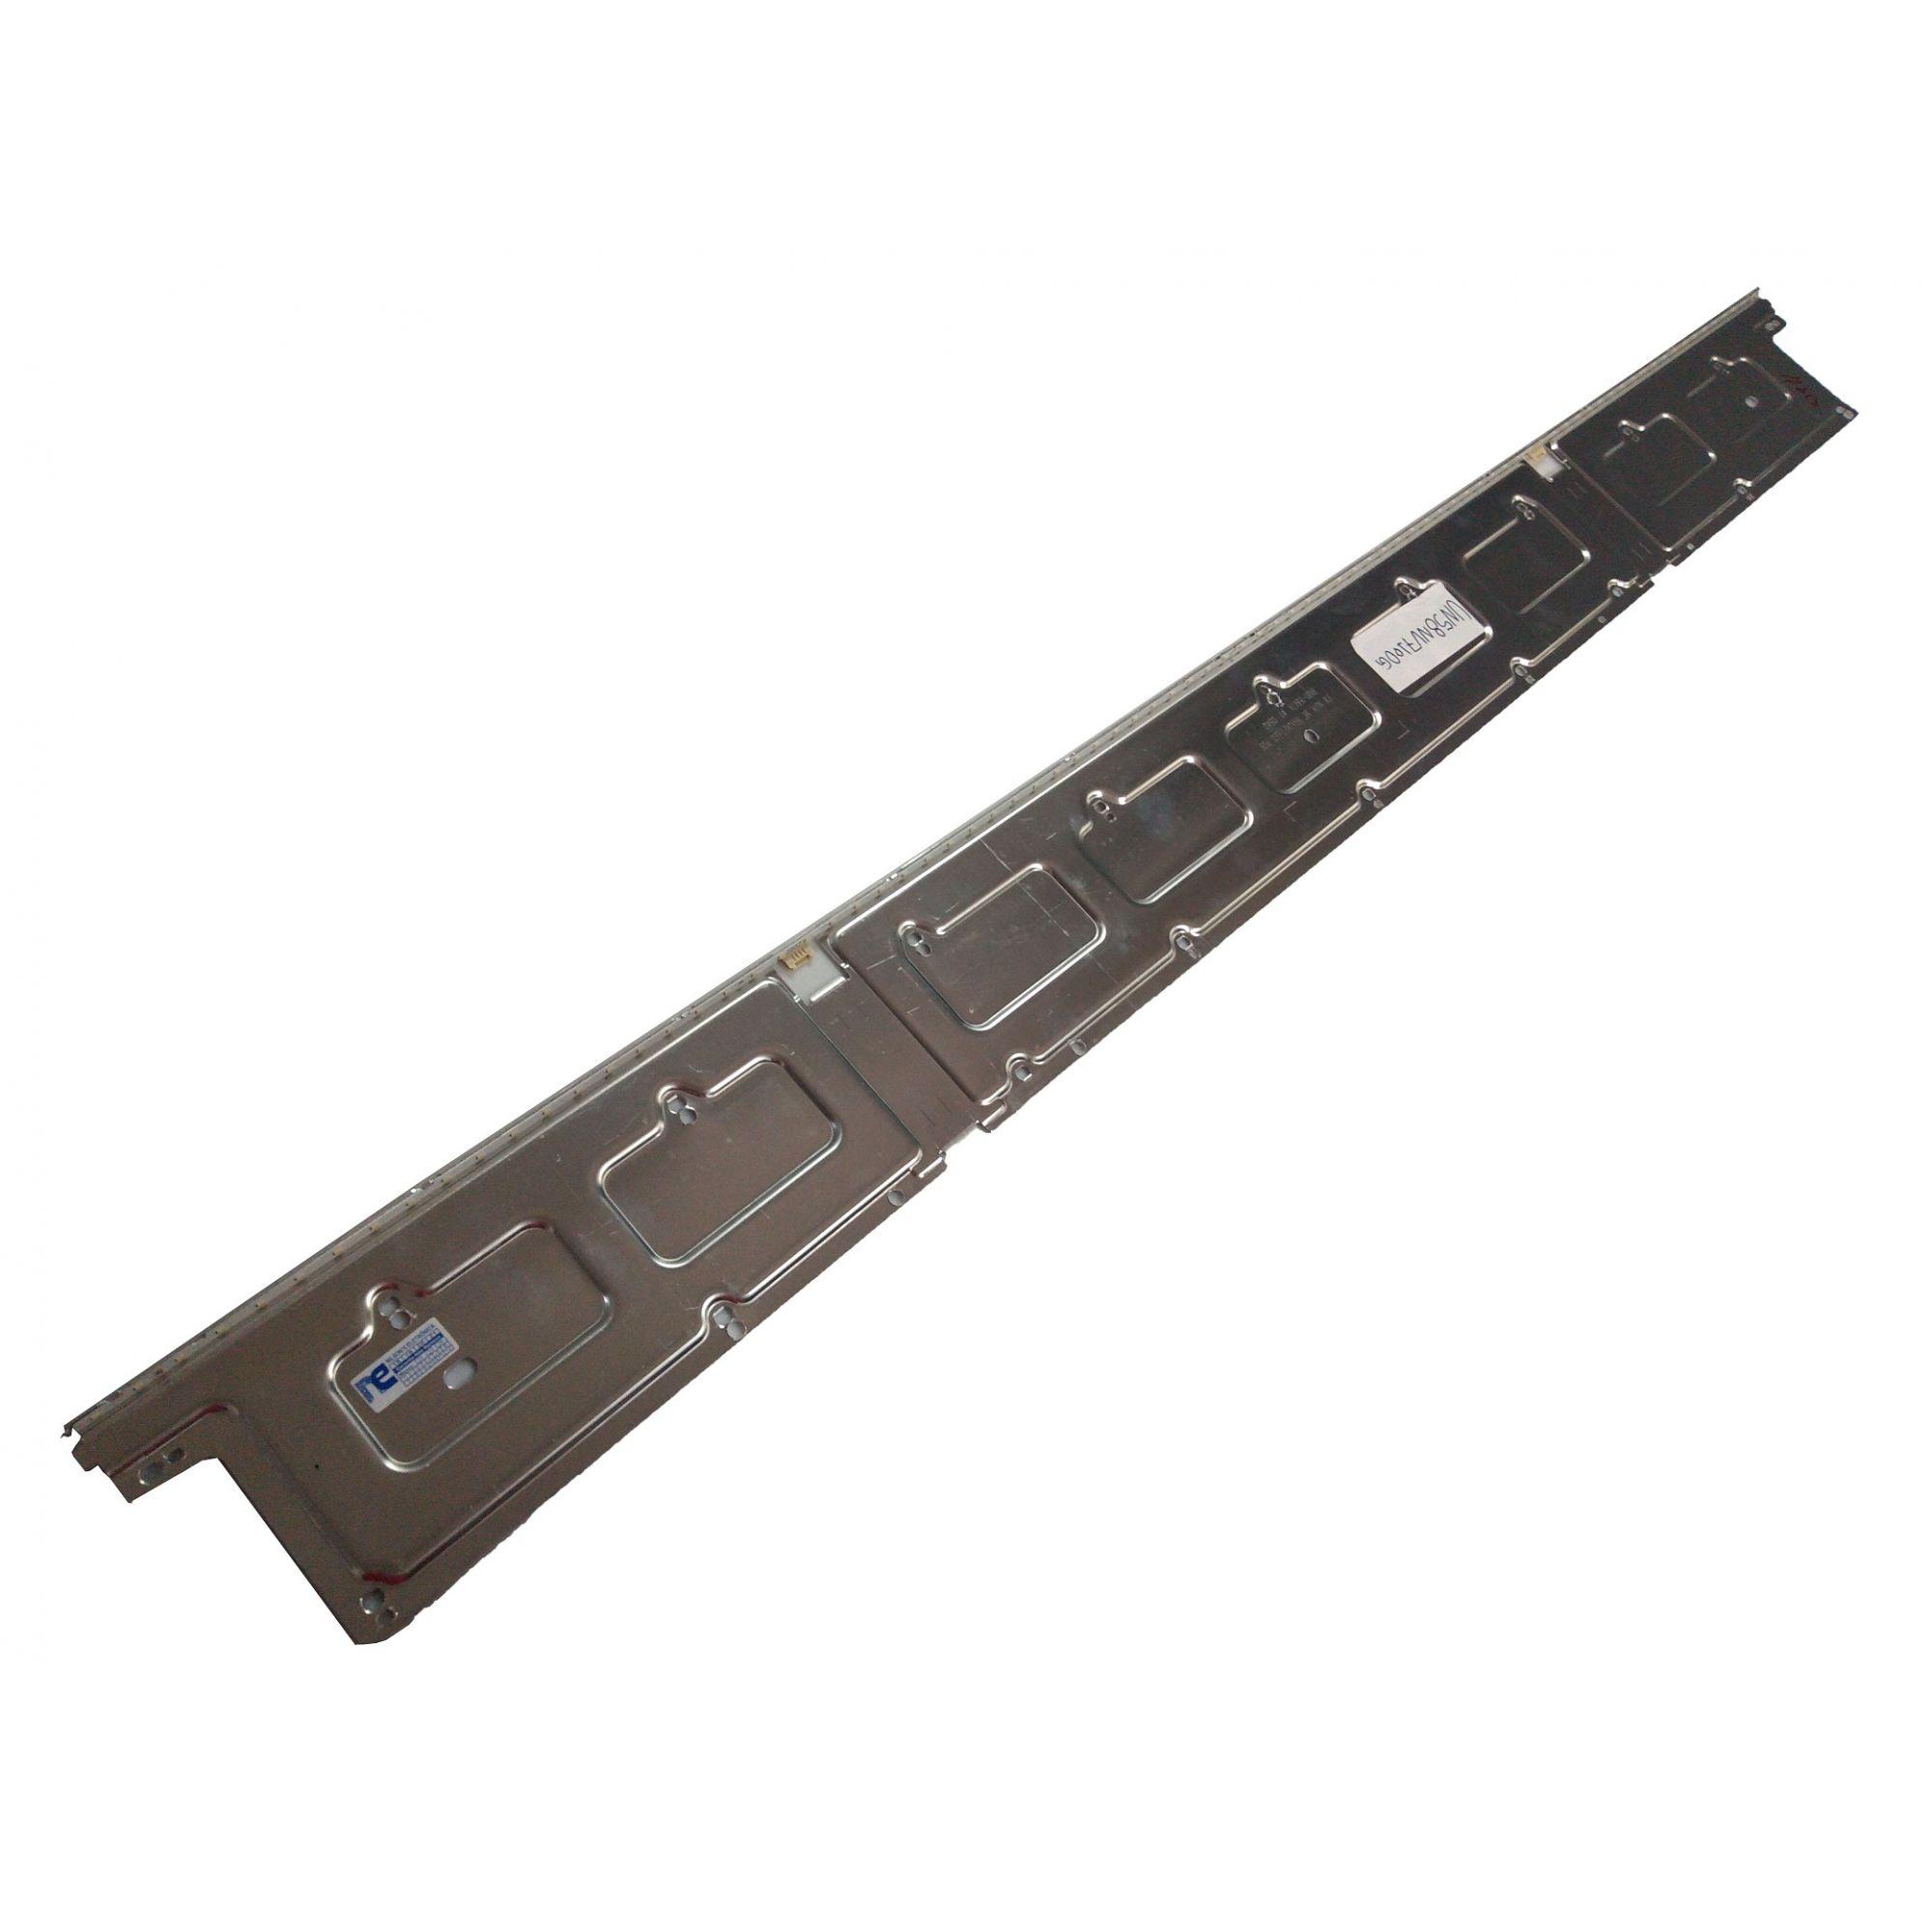 KIT BARRA DE LED SAMSUNG UN58NU7100 UN58RU7100 LM41-00632A